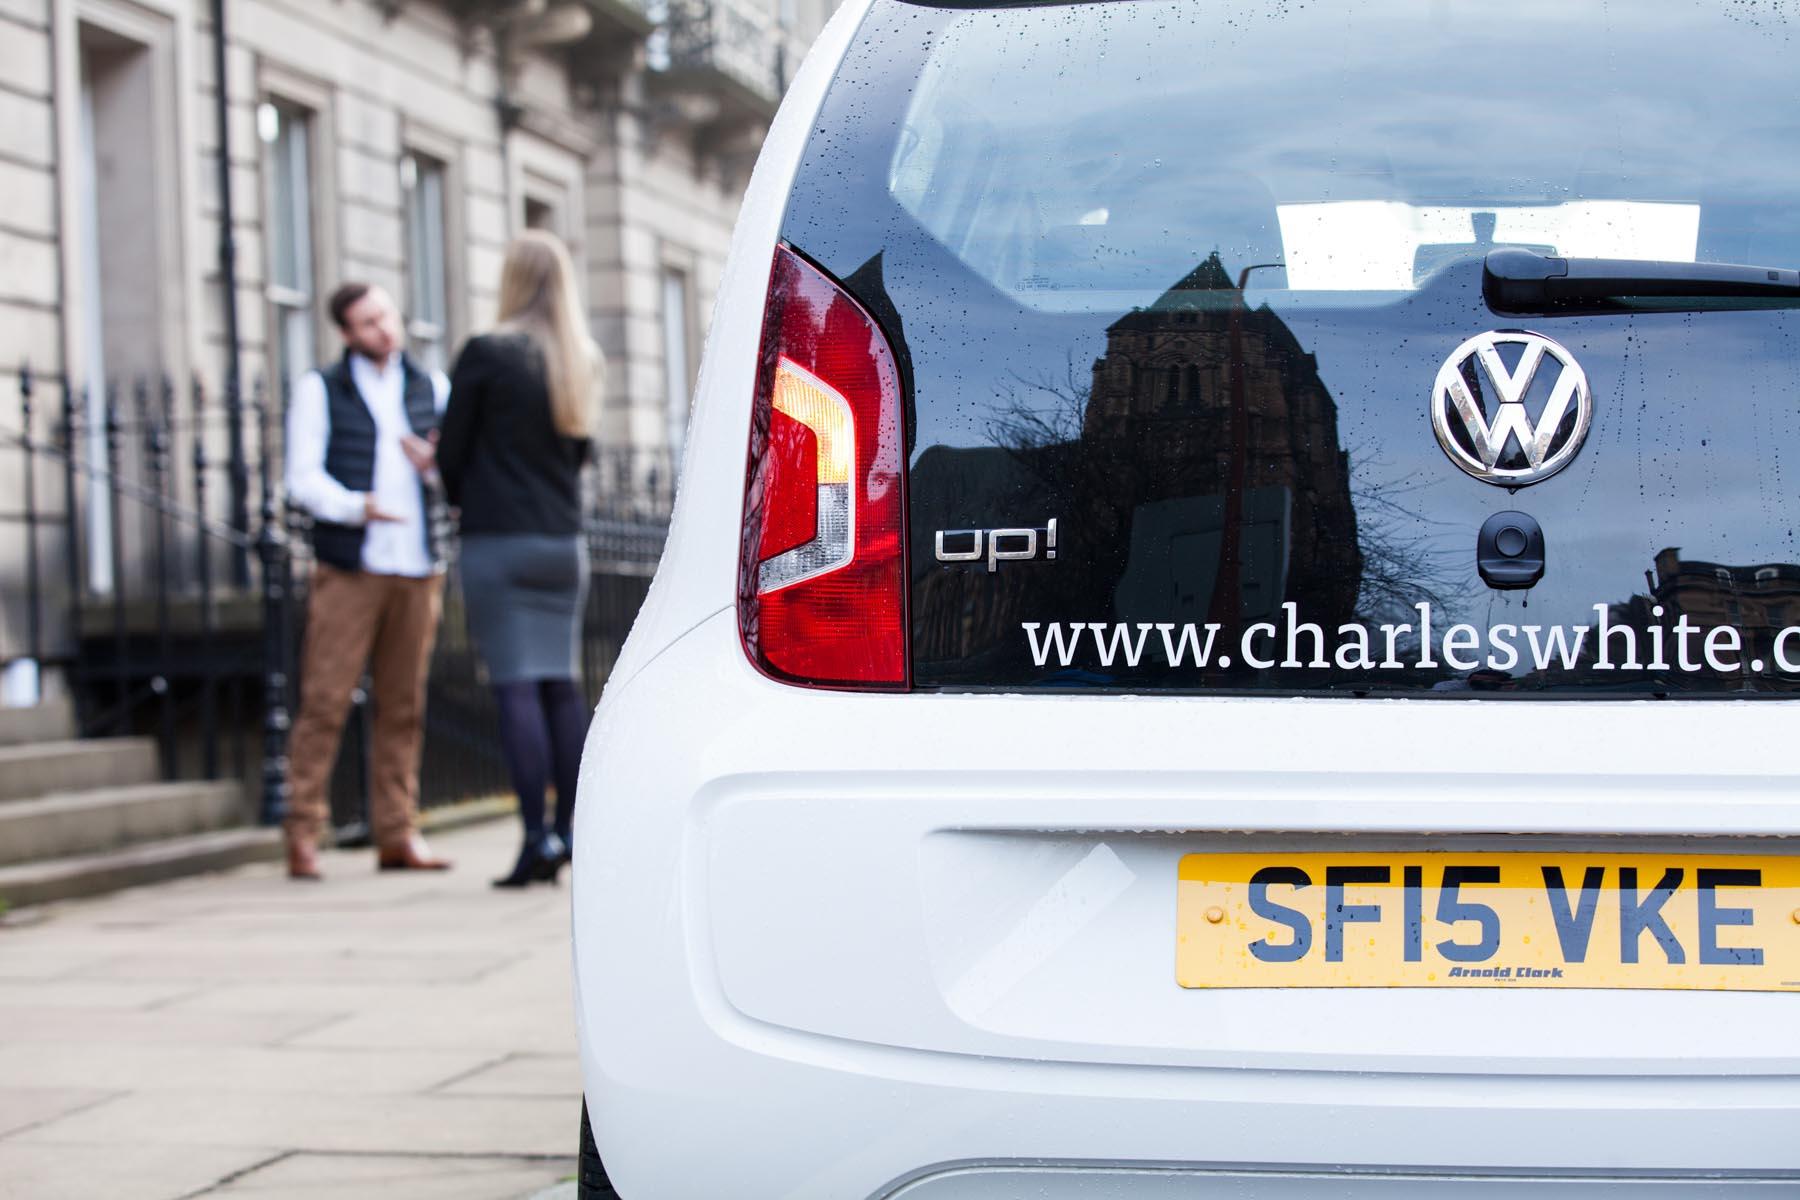 Why Charles White